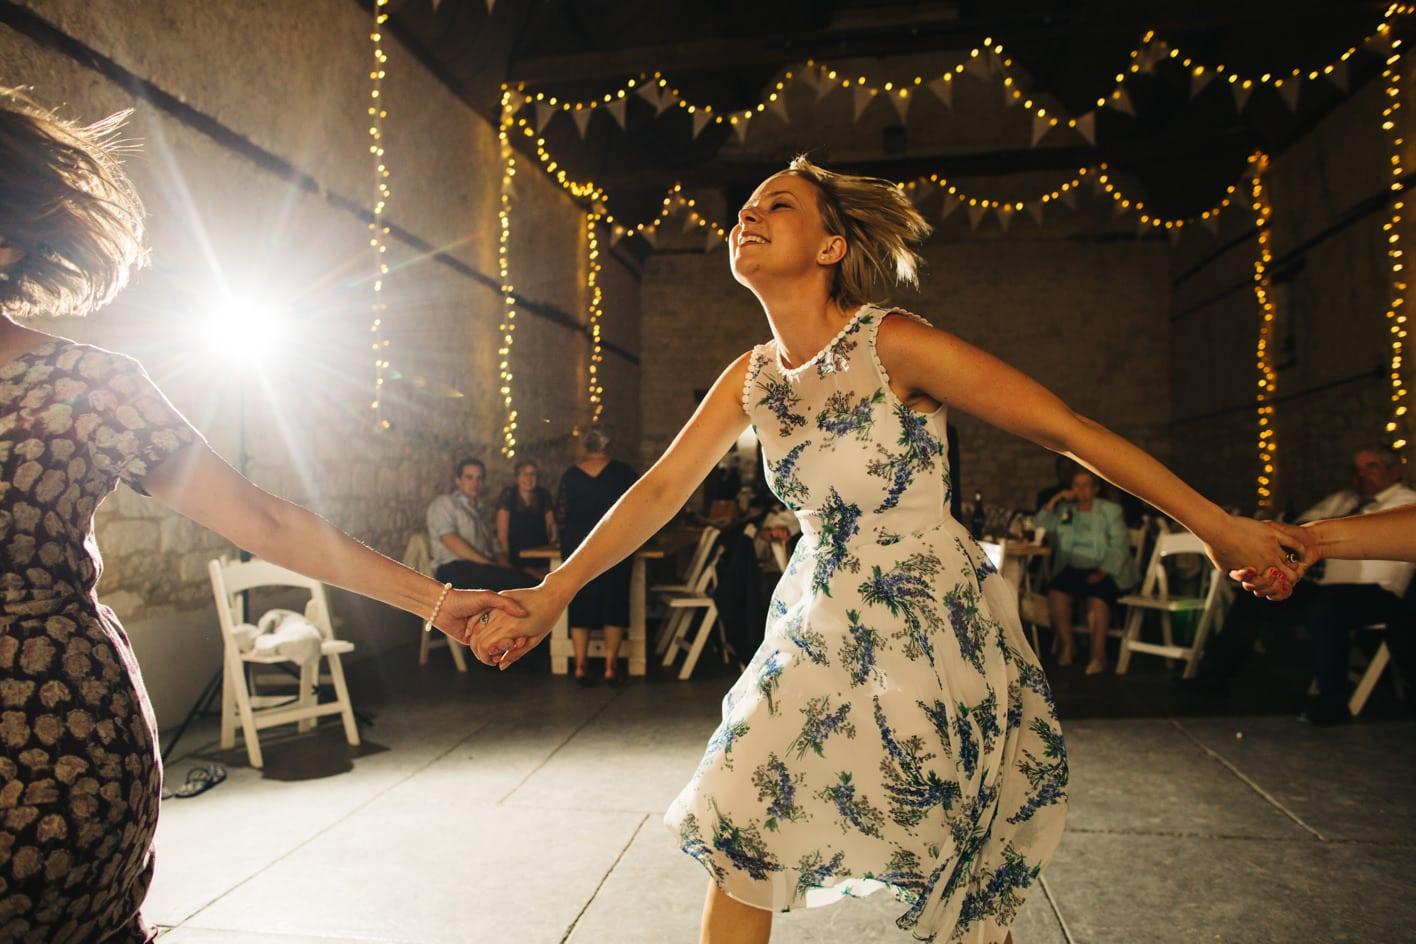 guest dancing at rustic wedding